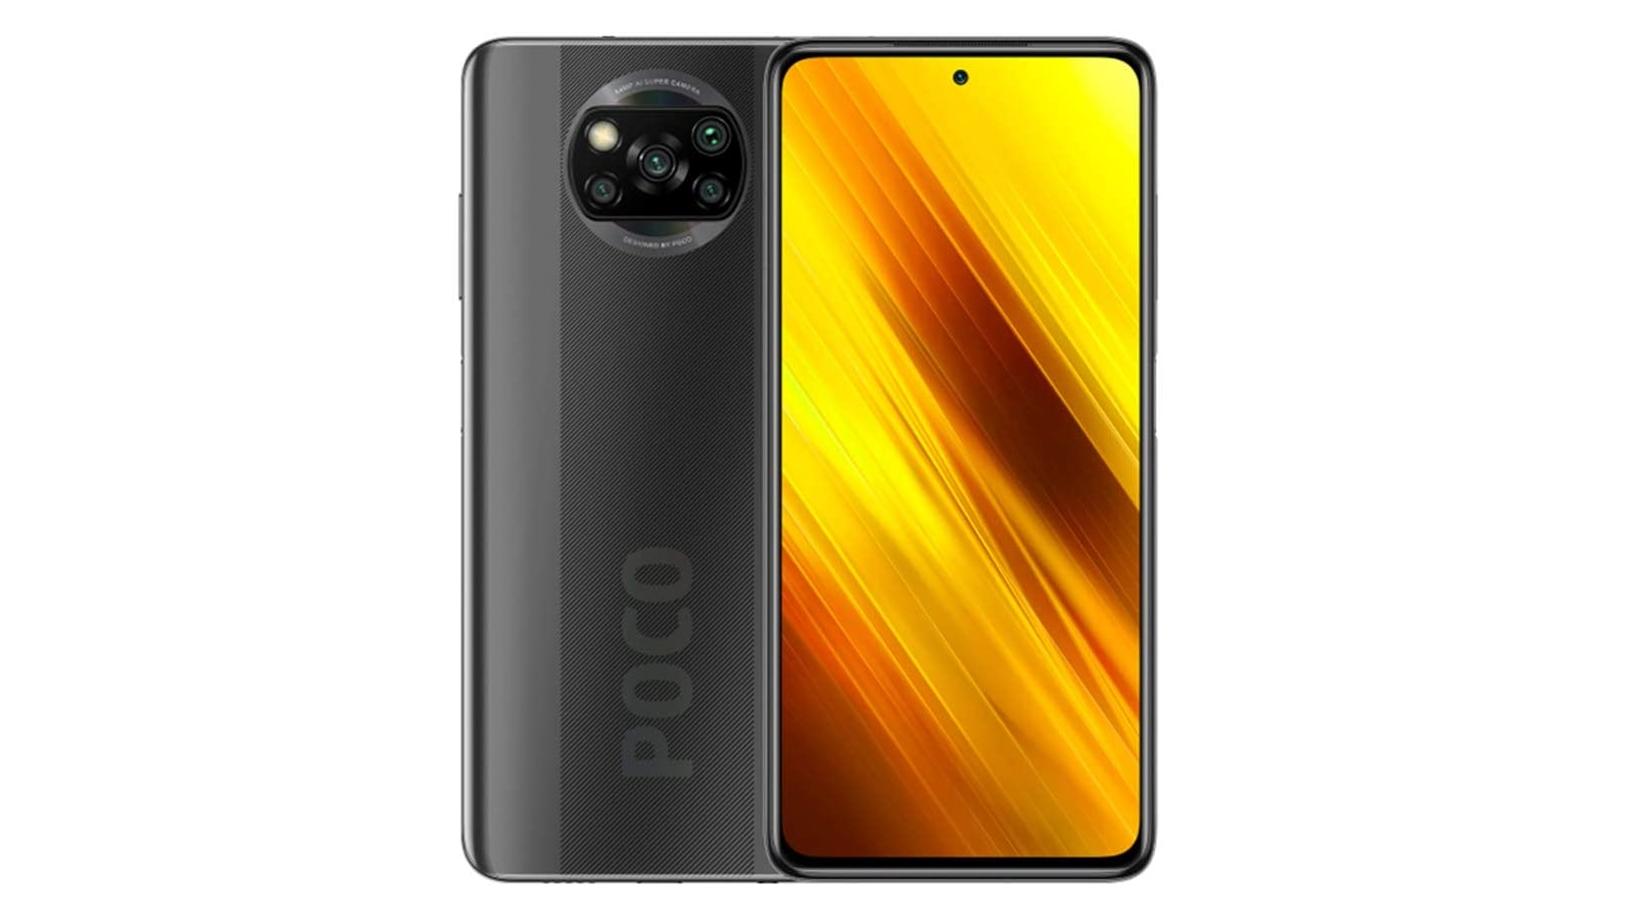 A Xiaomi Poco X3 NFC against a white background